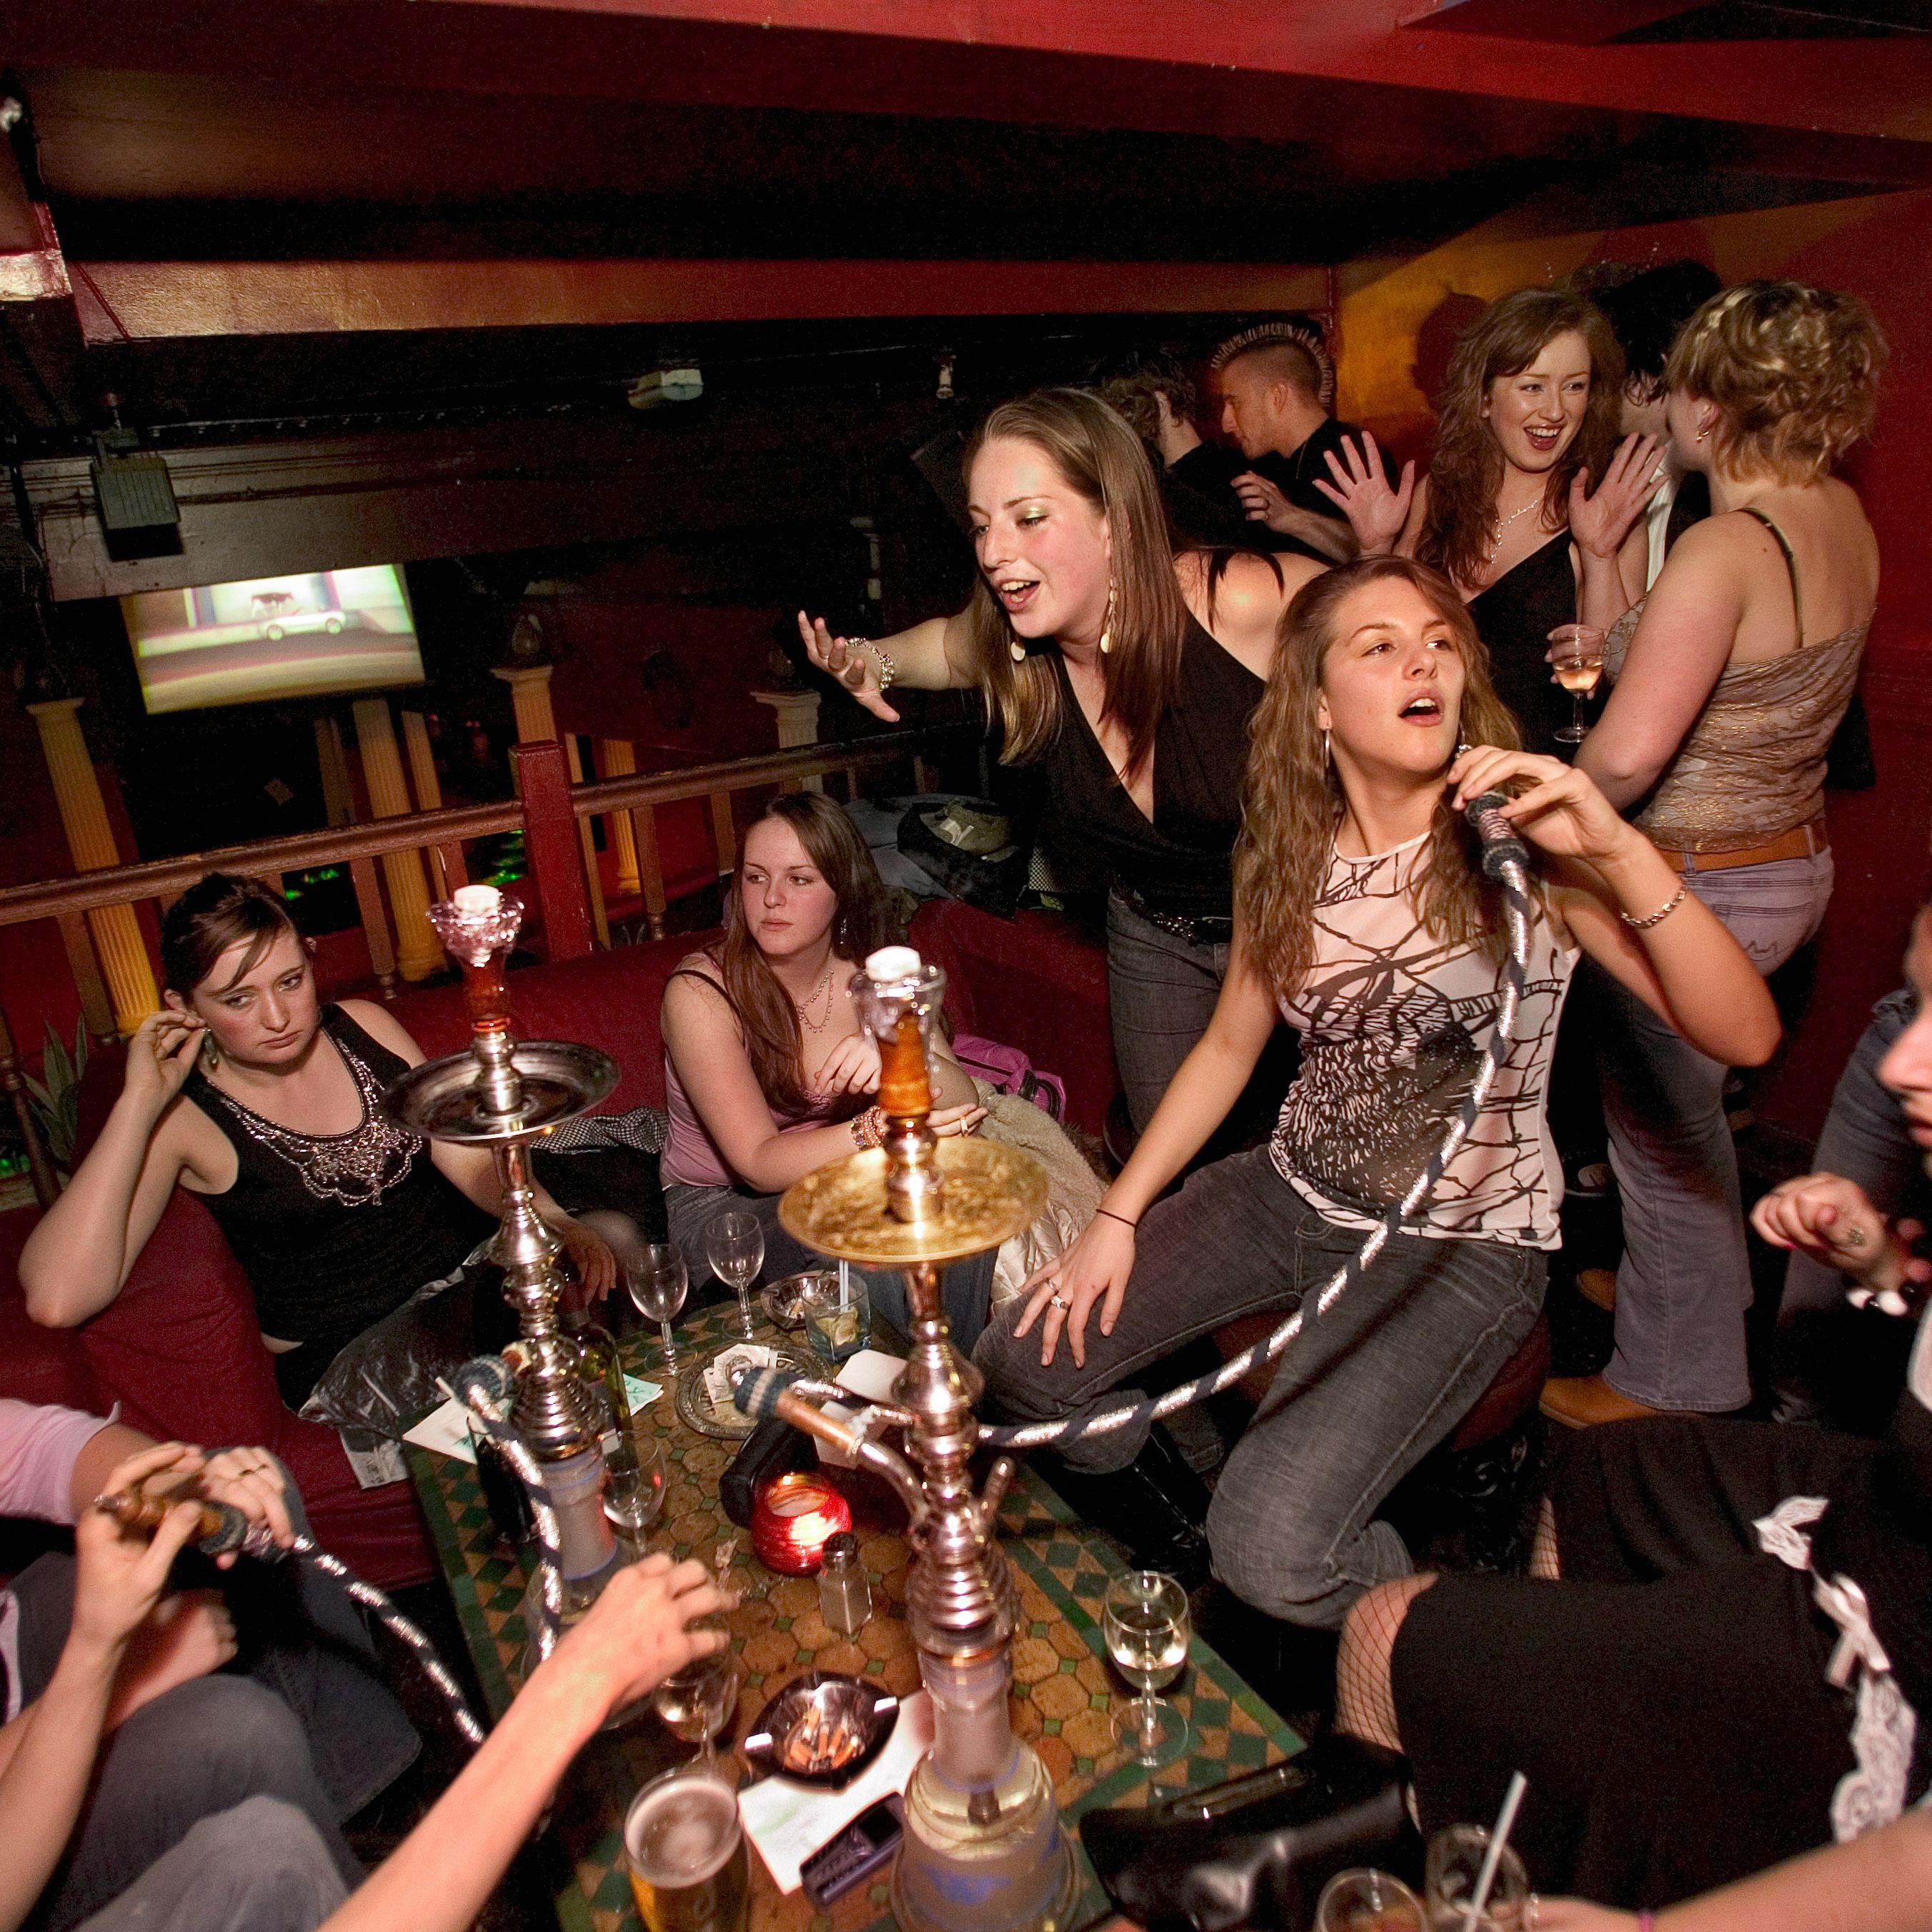 hookah hookup cigarer singles dating linje